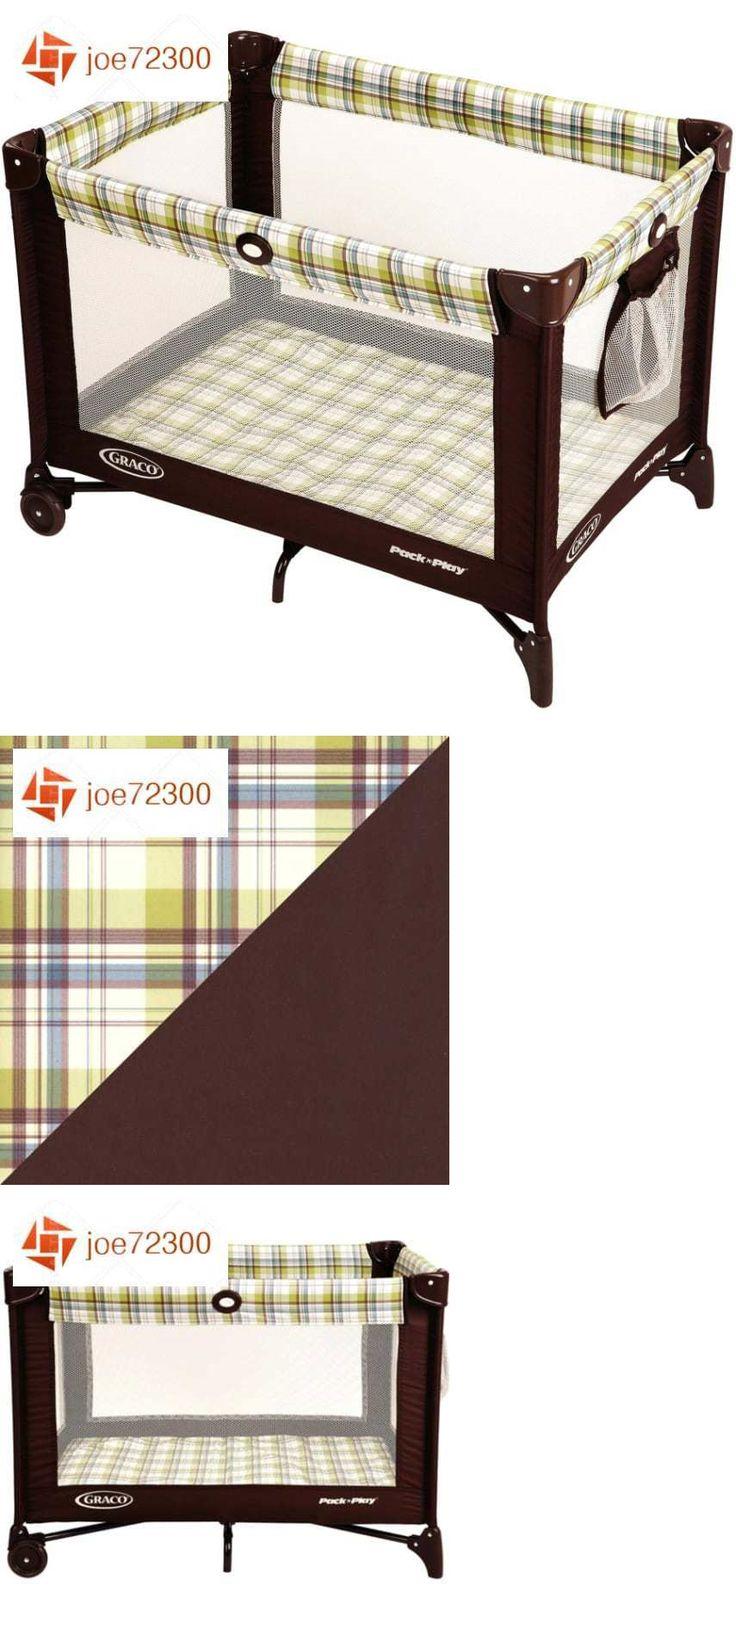 Baby Gear 100223 Graco Pack And Play Playard Ashford Portable Crib Travel Bassinet Playpen